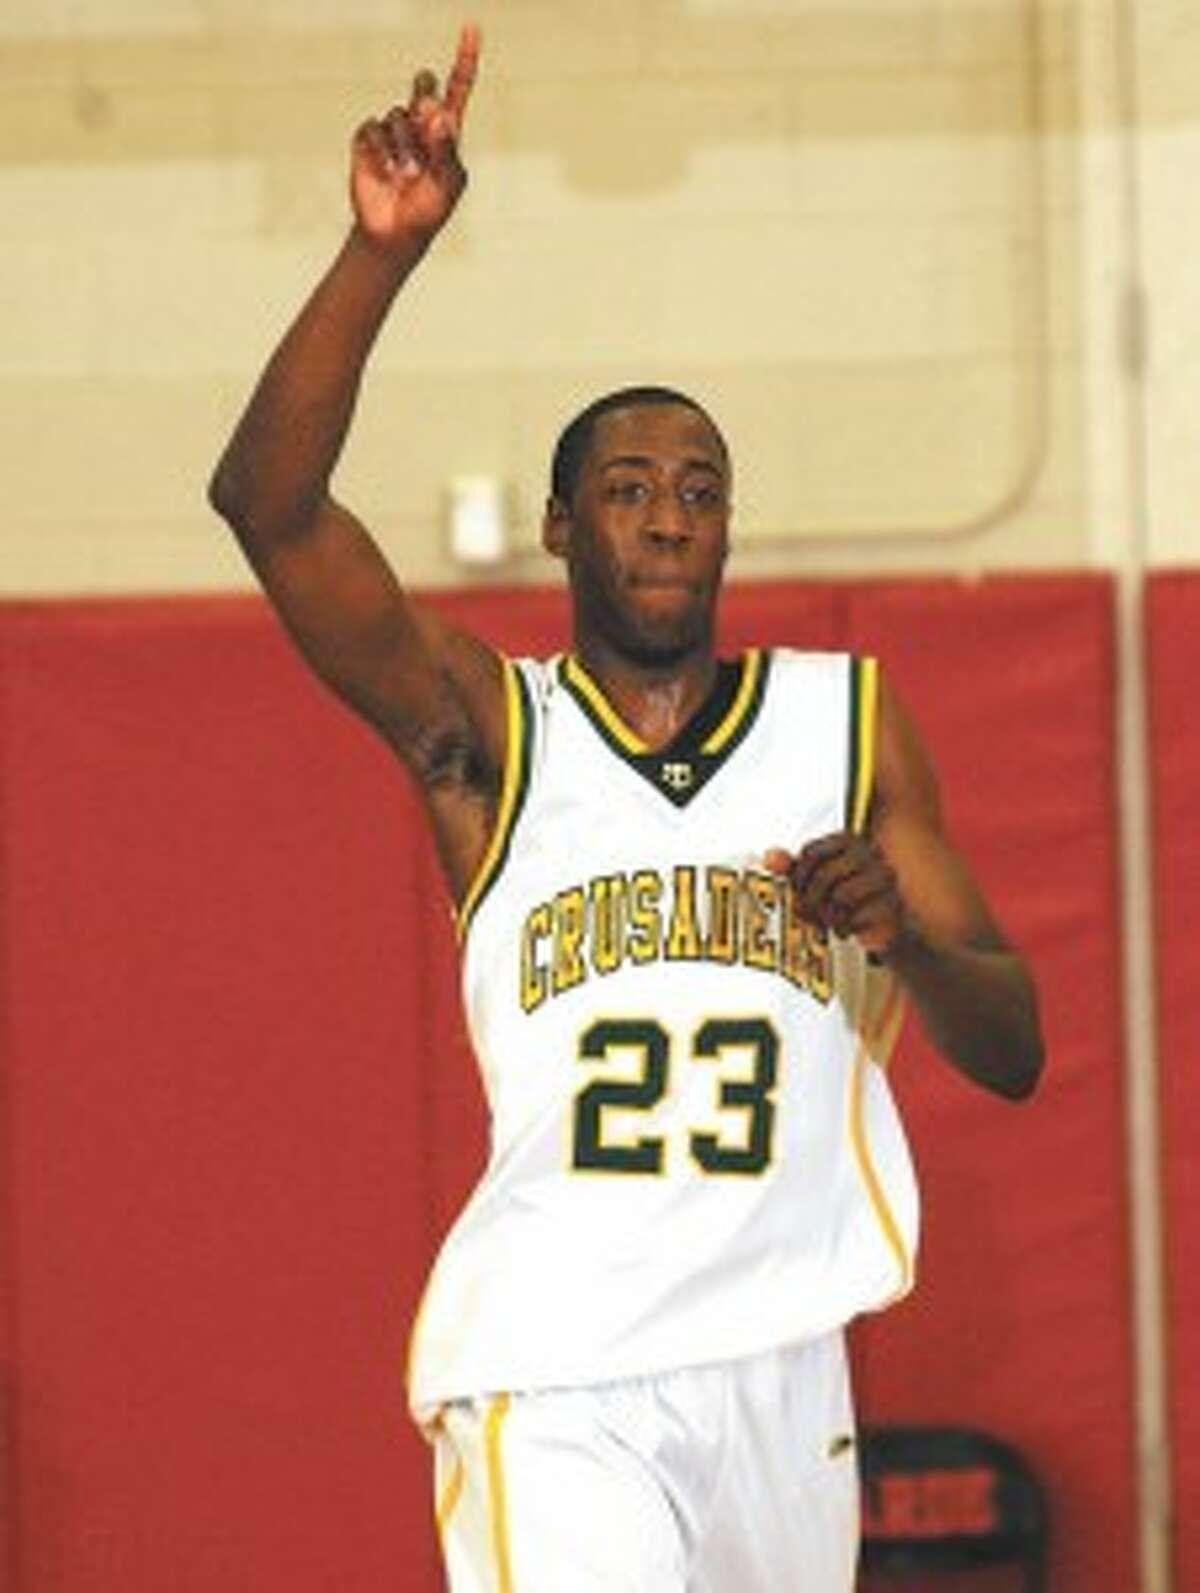 Baskin To Play Basketball At Quinnipiac